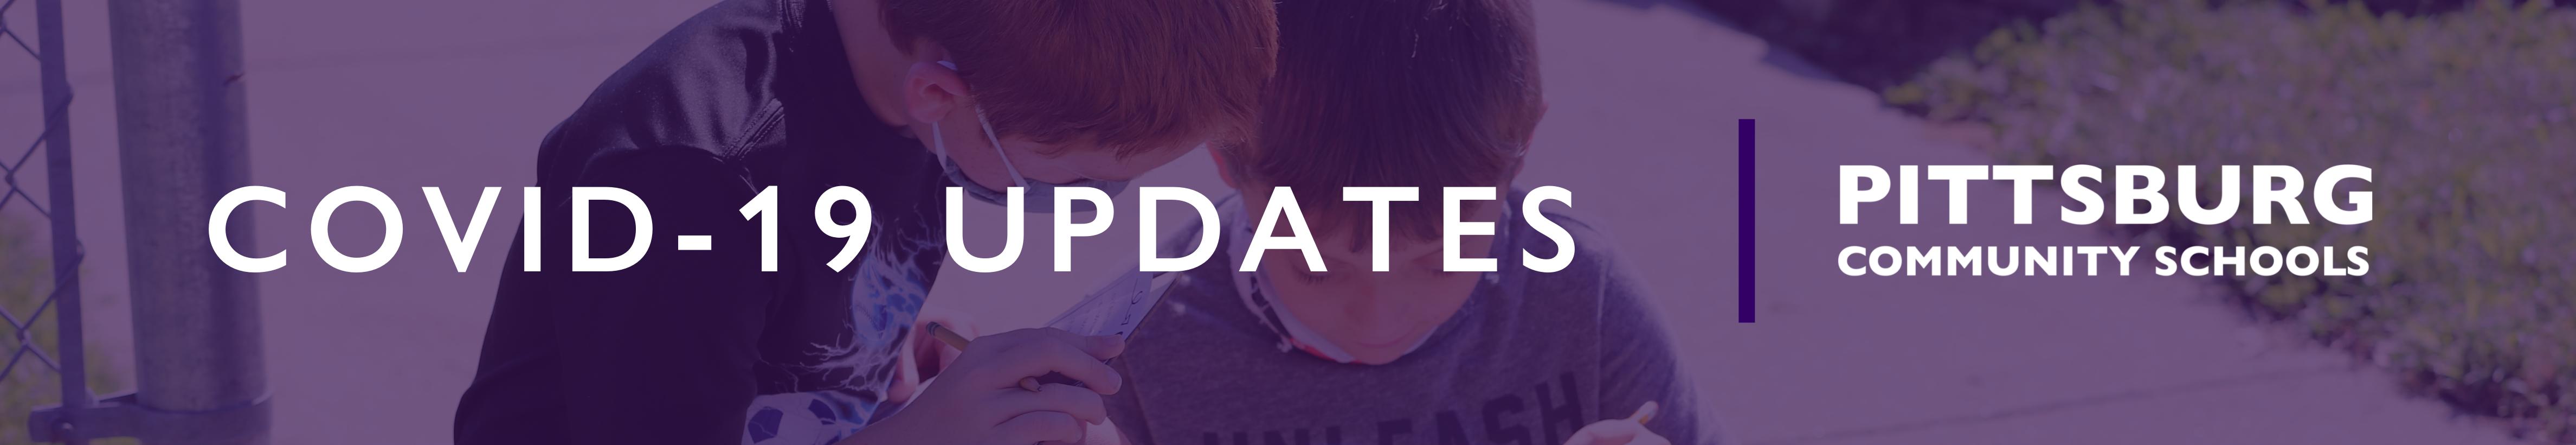 Covid-19 Updates Pittsburg Community Schools